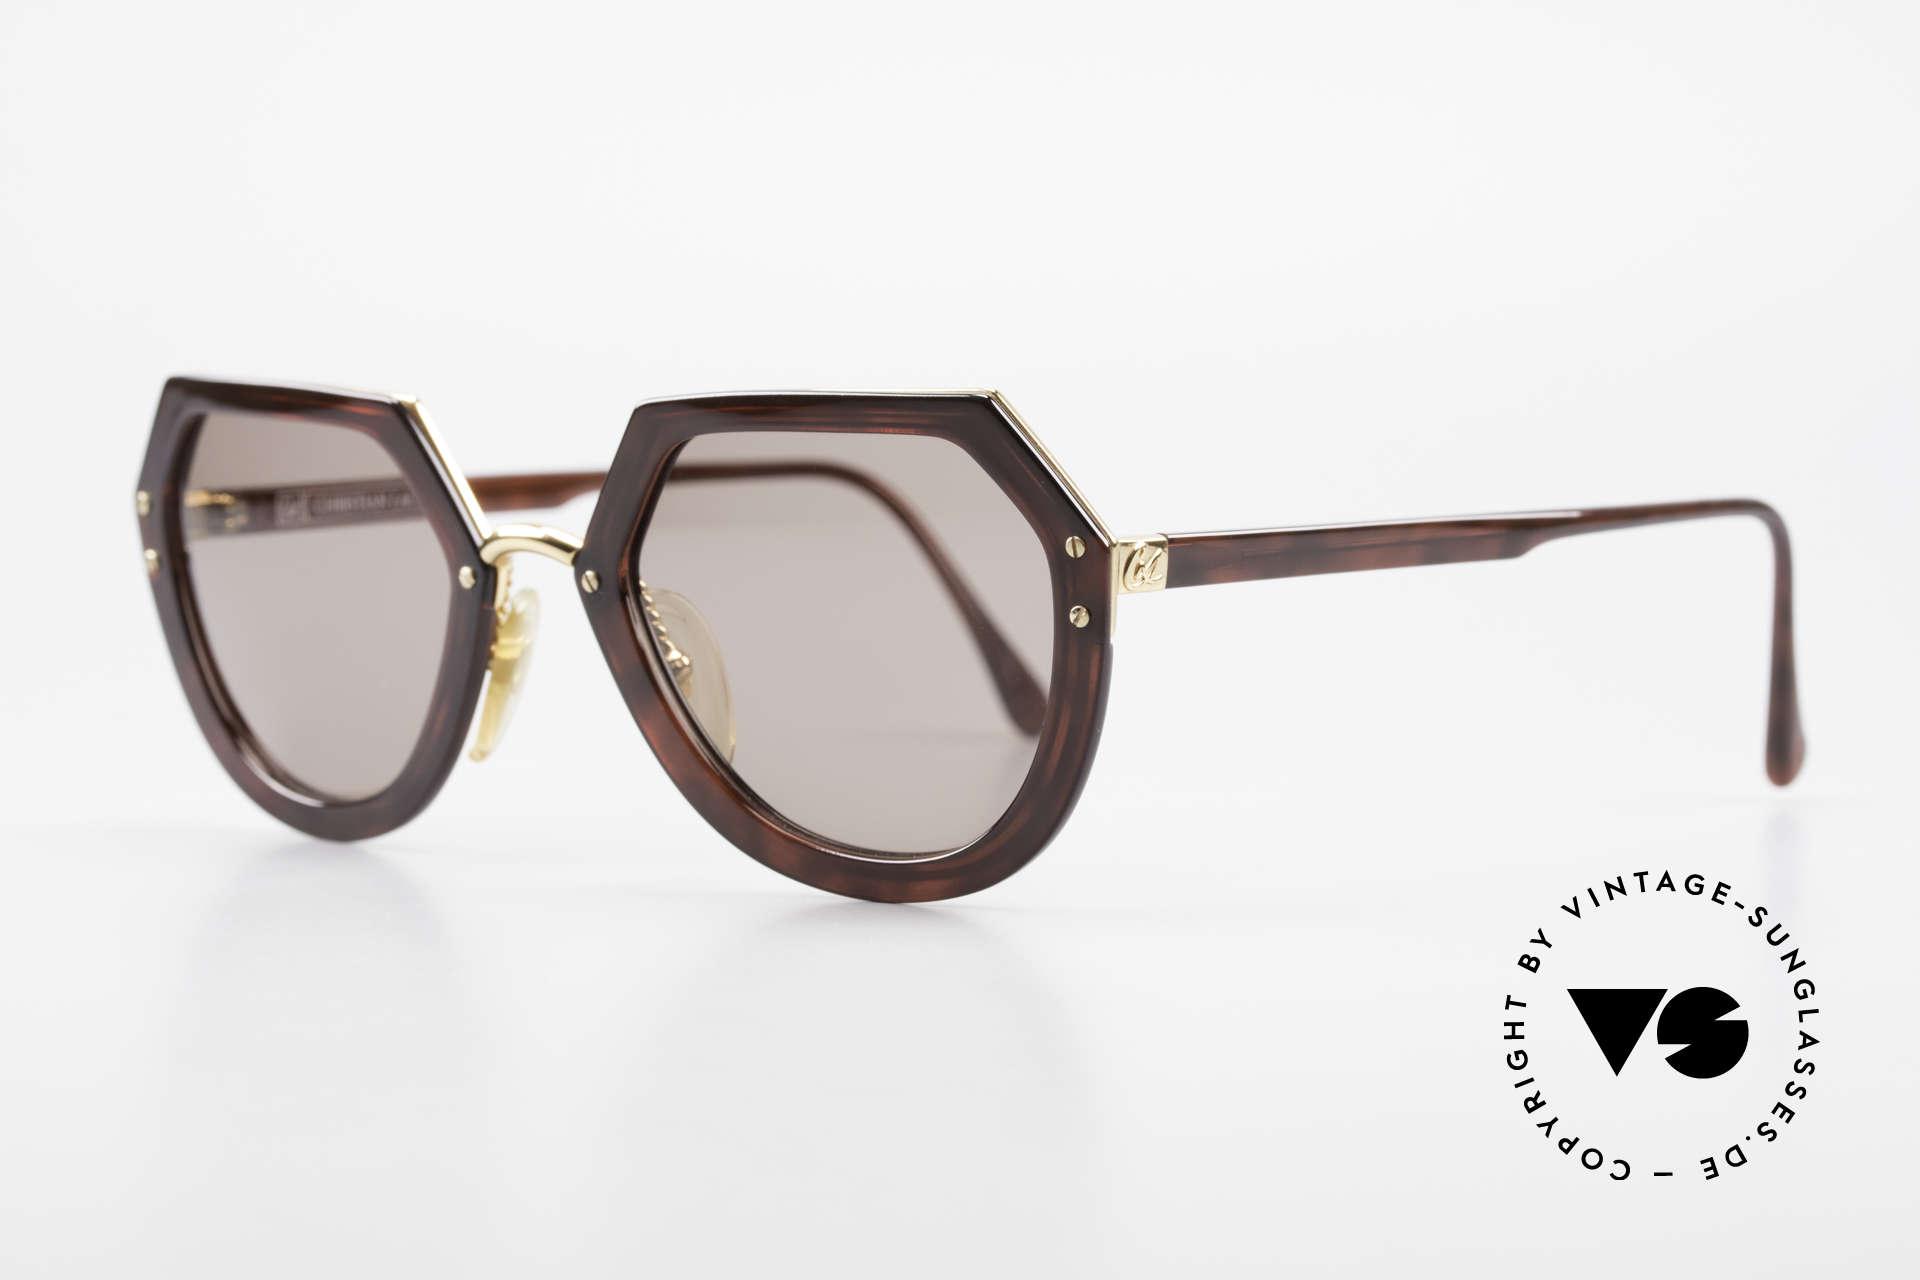 Christian LaCroix 7310 Rokoko Vintage Sonnenbrille, genialer OPTYL-Kunststoff & hartvergoldetes Metall, Passend für Damen